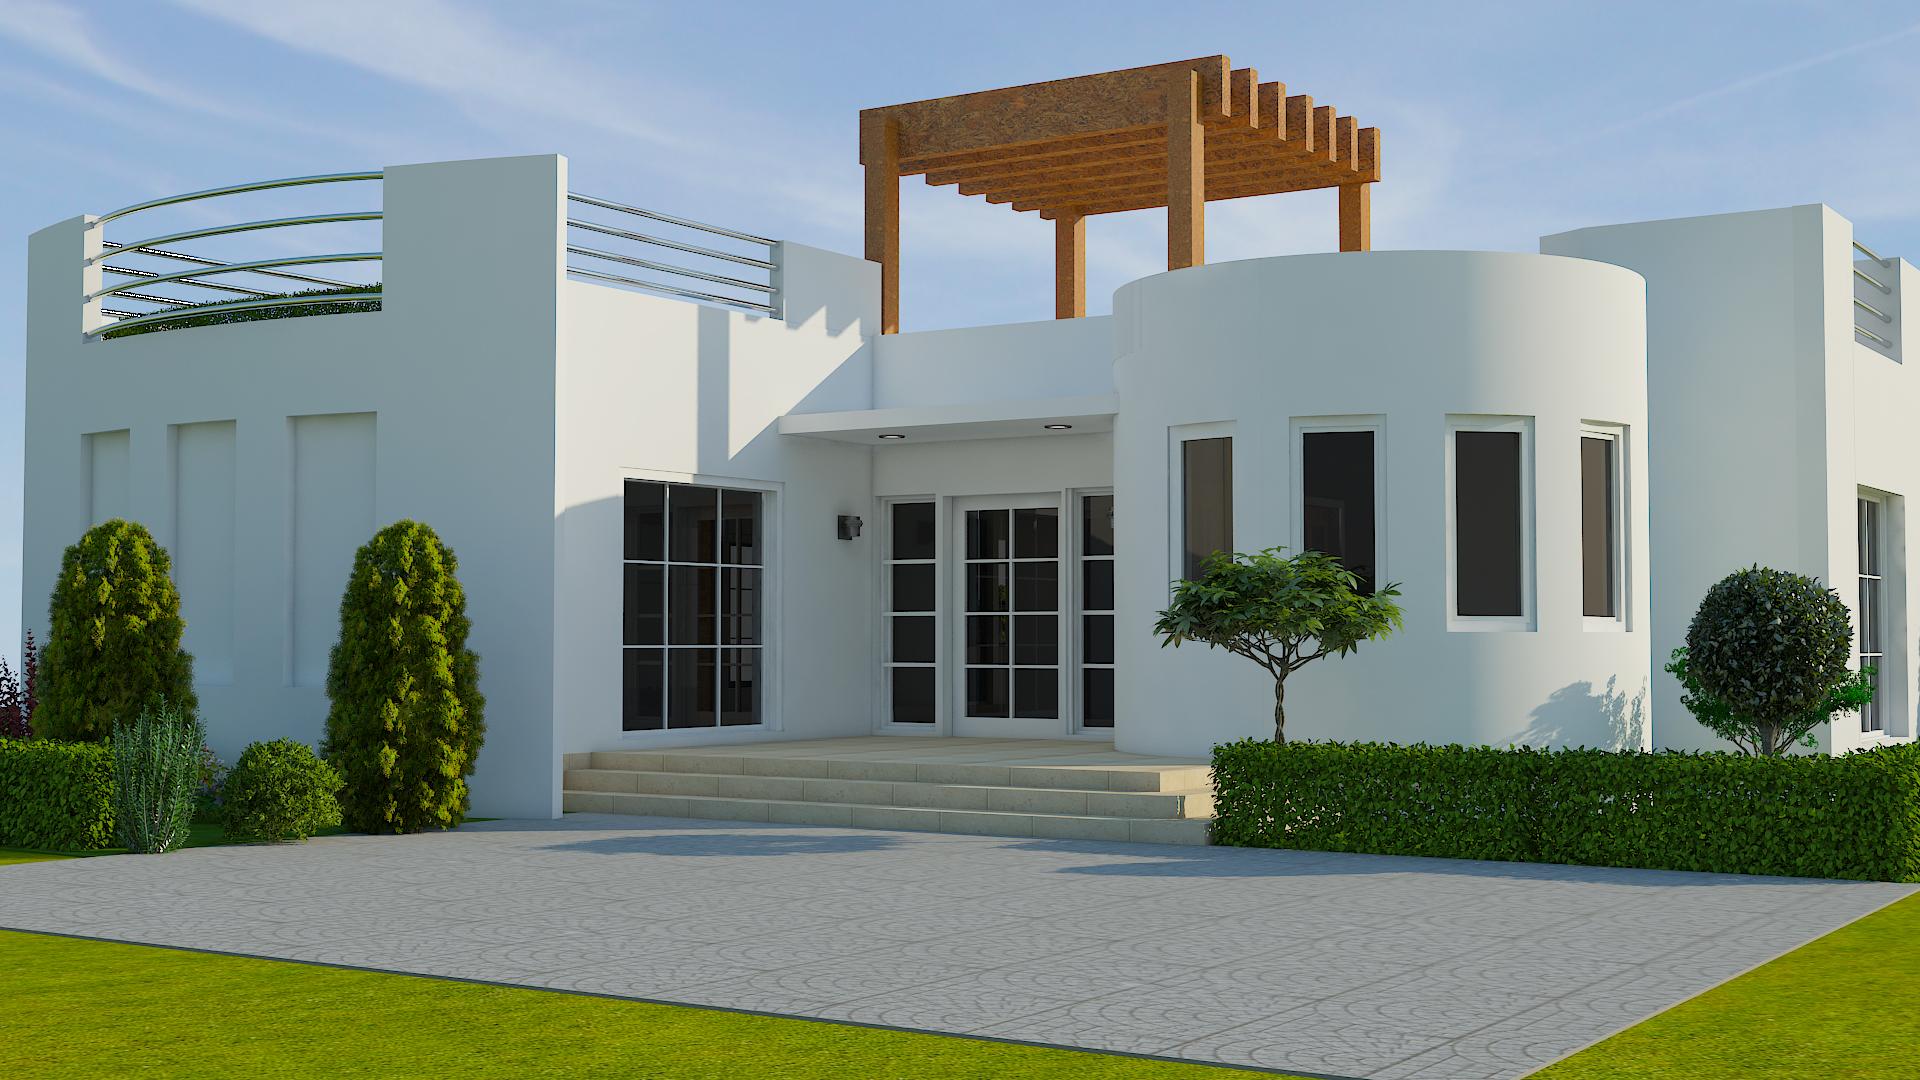 casa stampata 3d genesis sunconomy